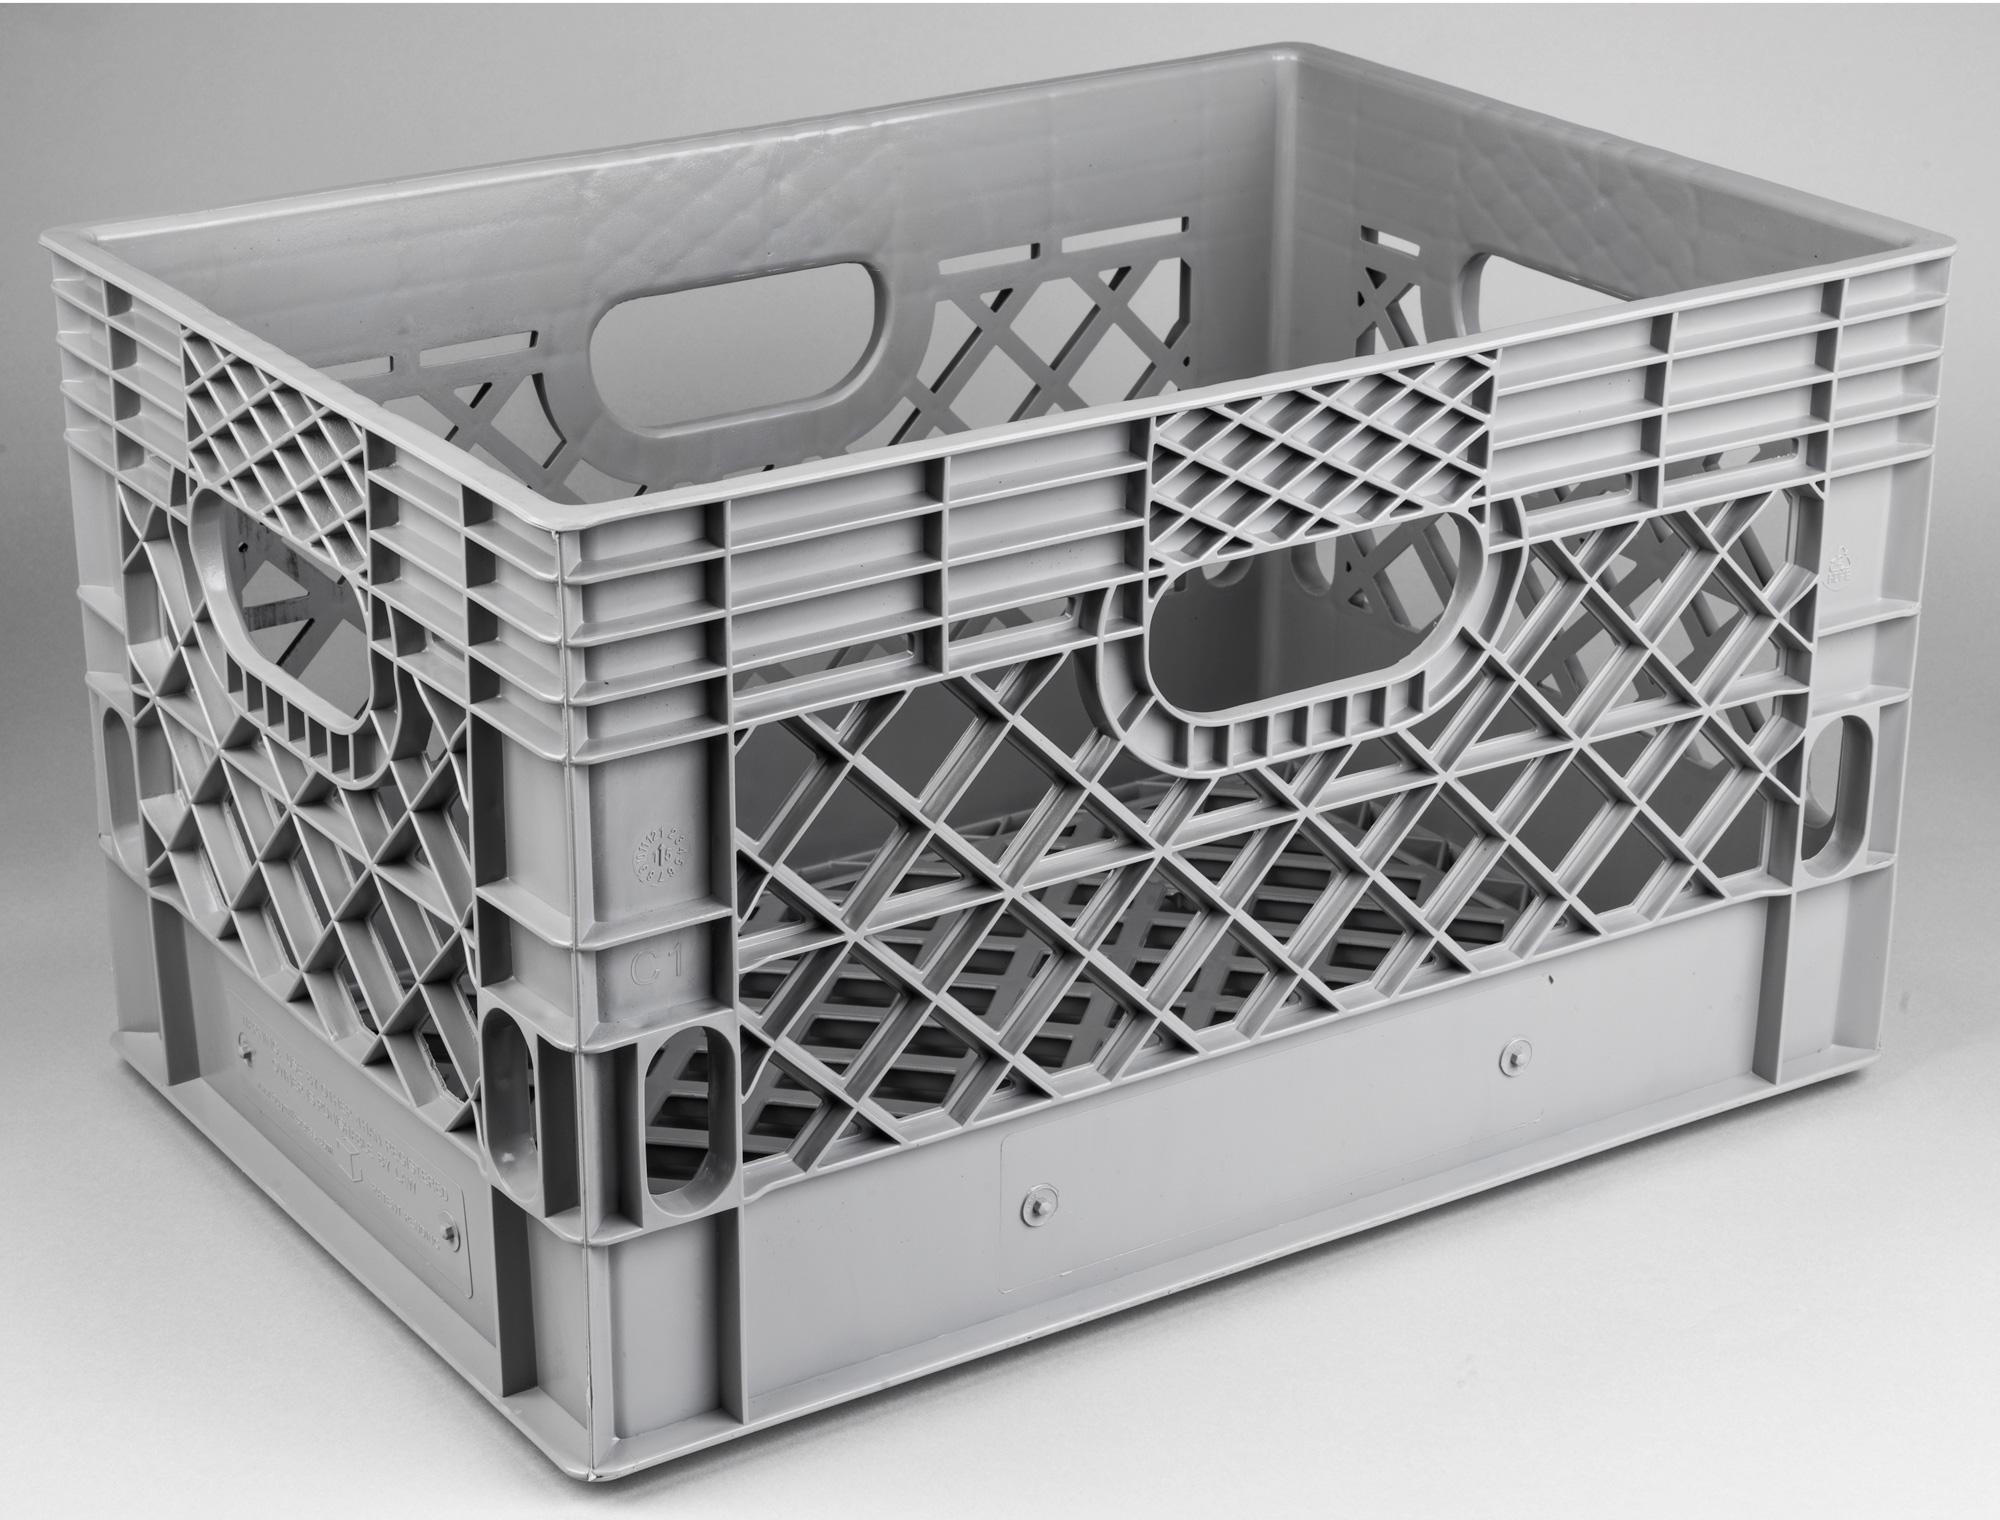 24 Quart Grey Plastic Milk Crate Gray